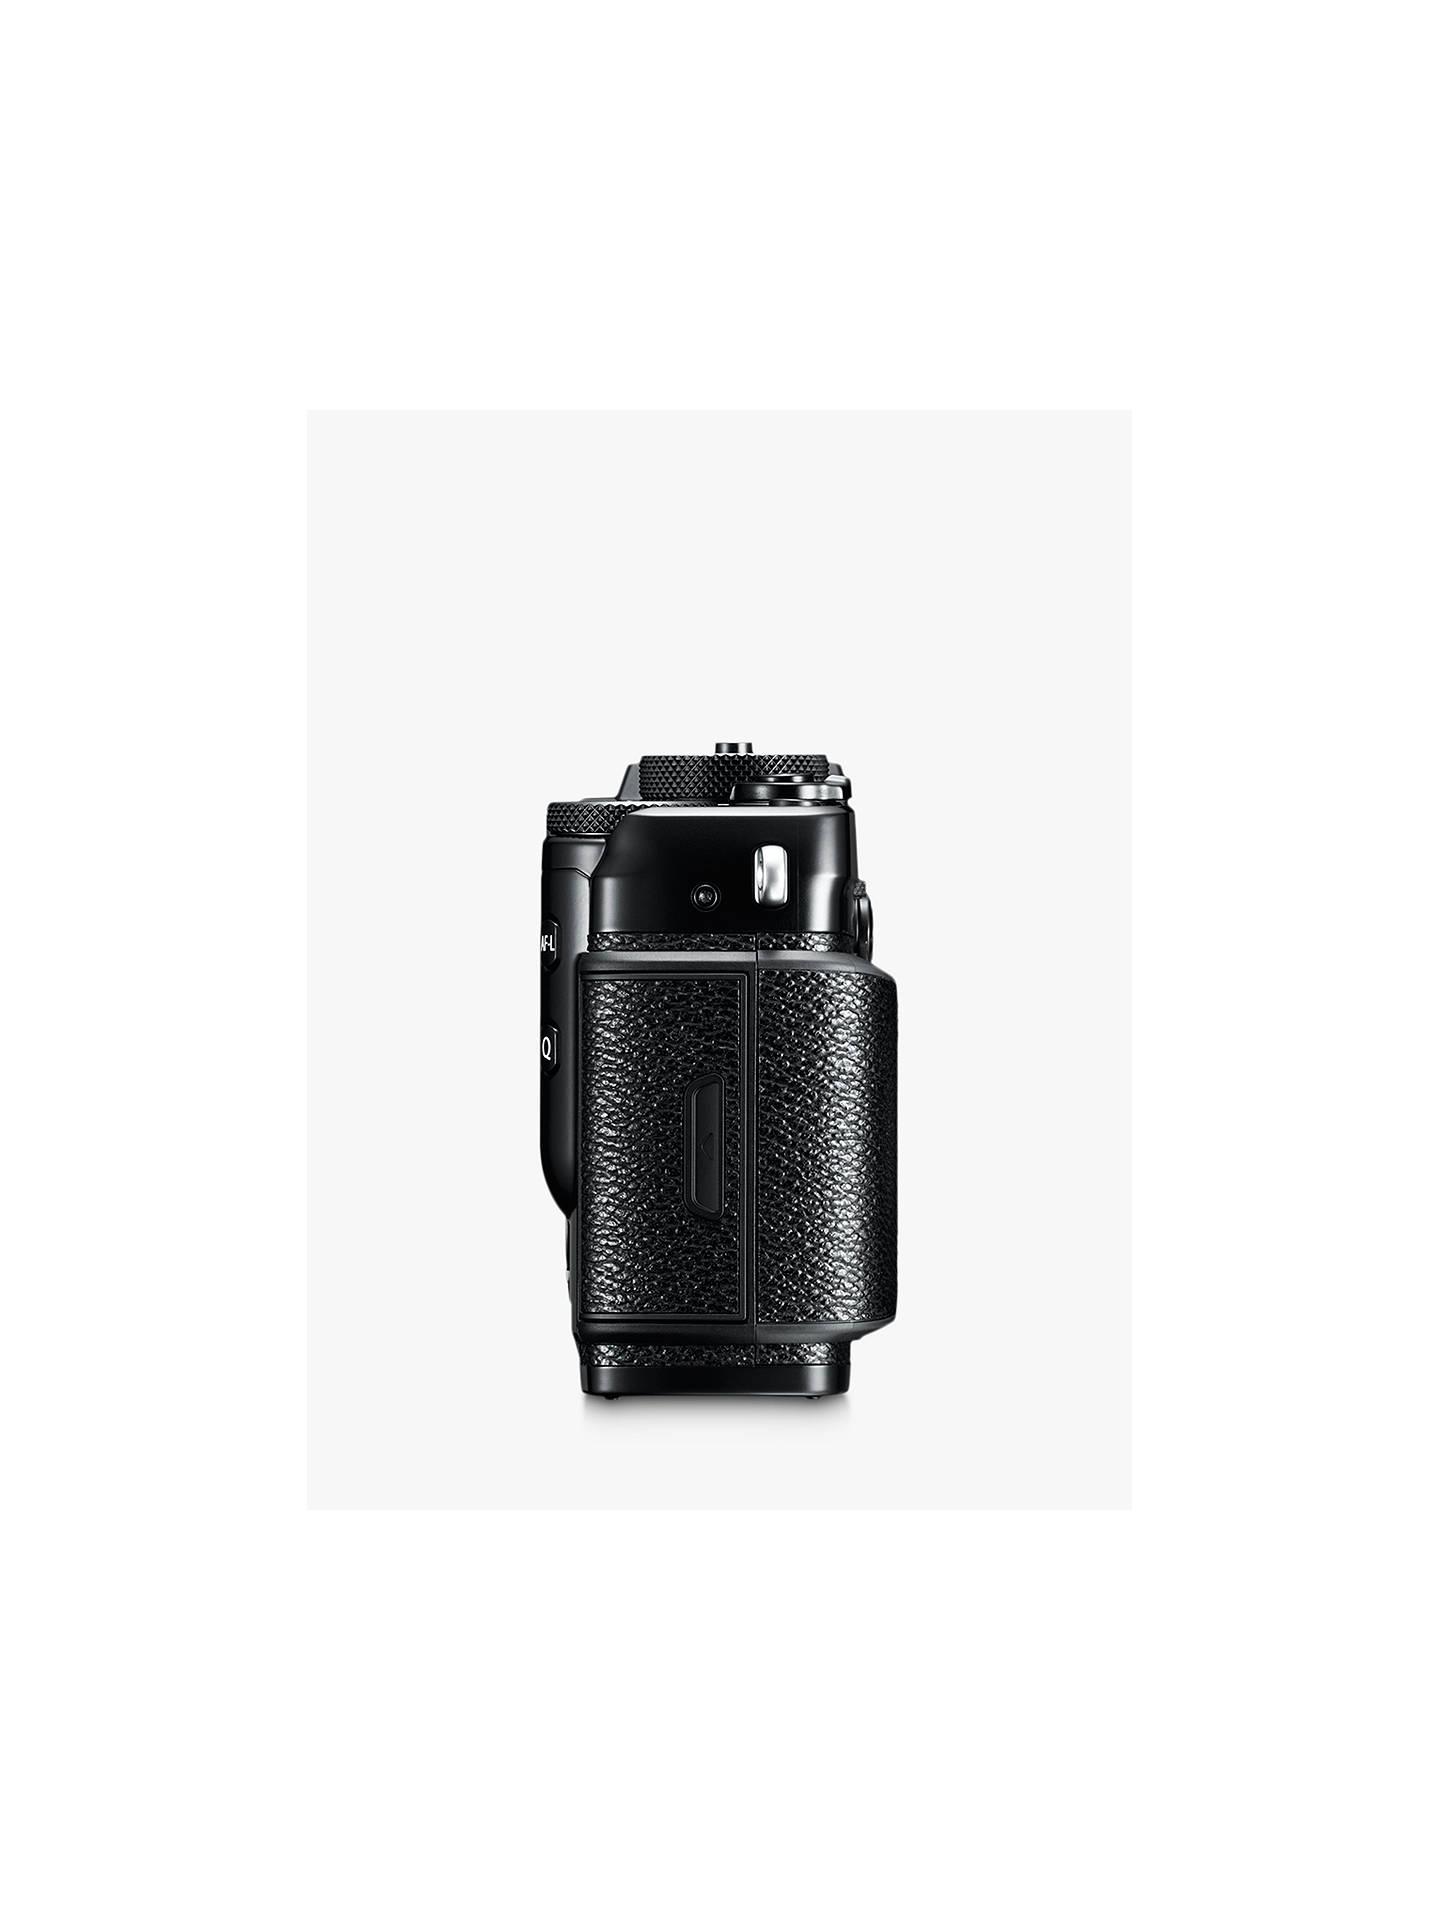 Fujifilm X-Pro 2 Compact System Camera, HD 1080p, 24 3MP, Wi-Fi, EVF, OVF, 3